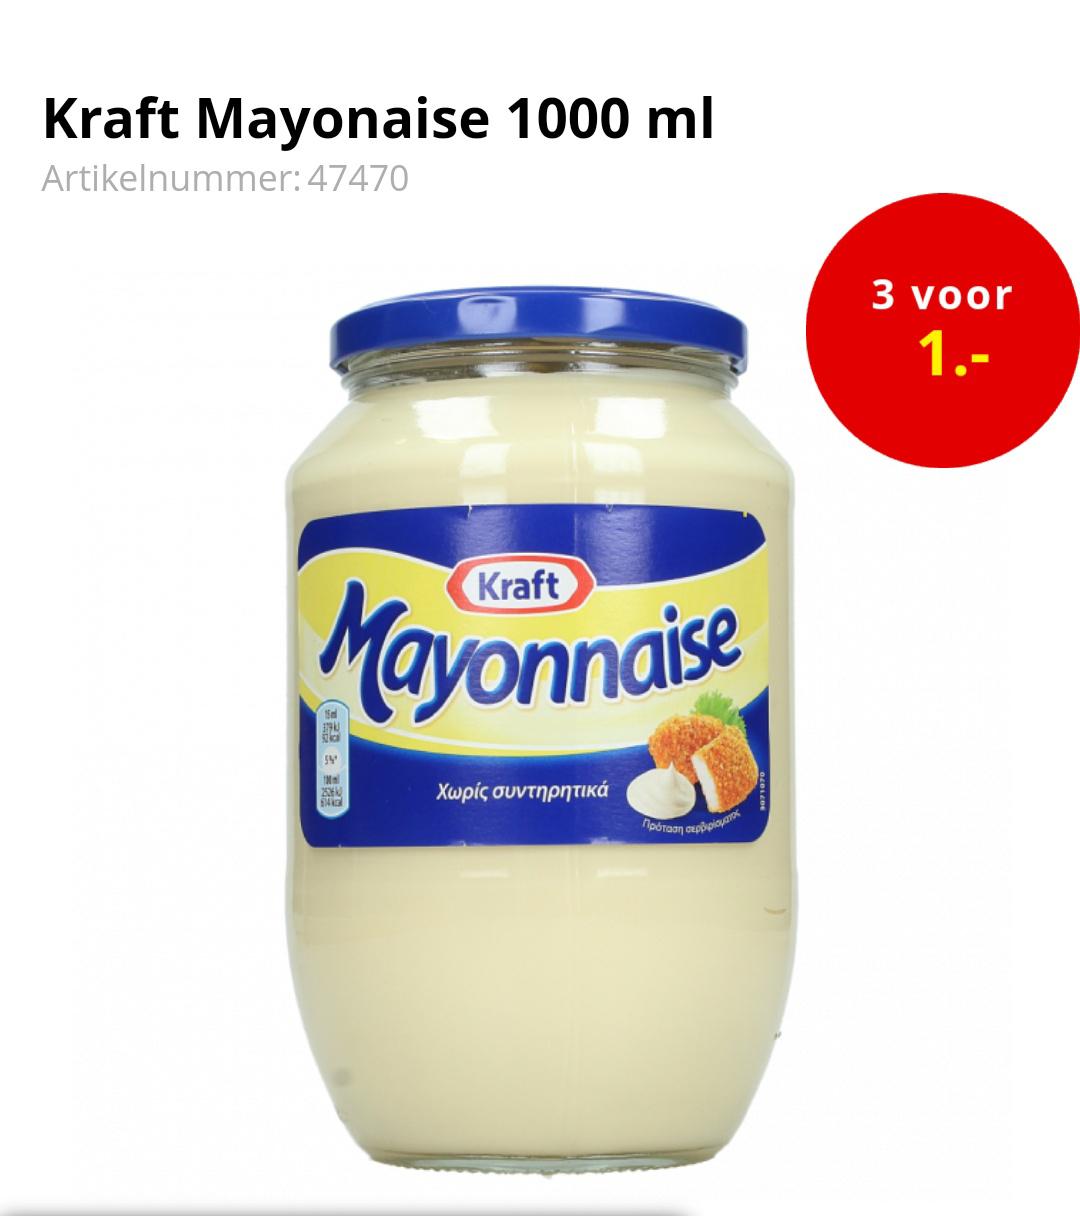 Kraft mayonaise 3 x 1 liter voor maar €1 @ op=op voordeelshop